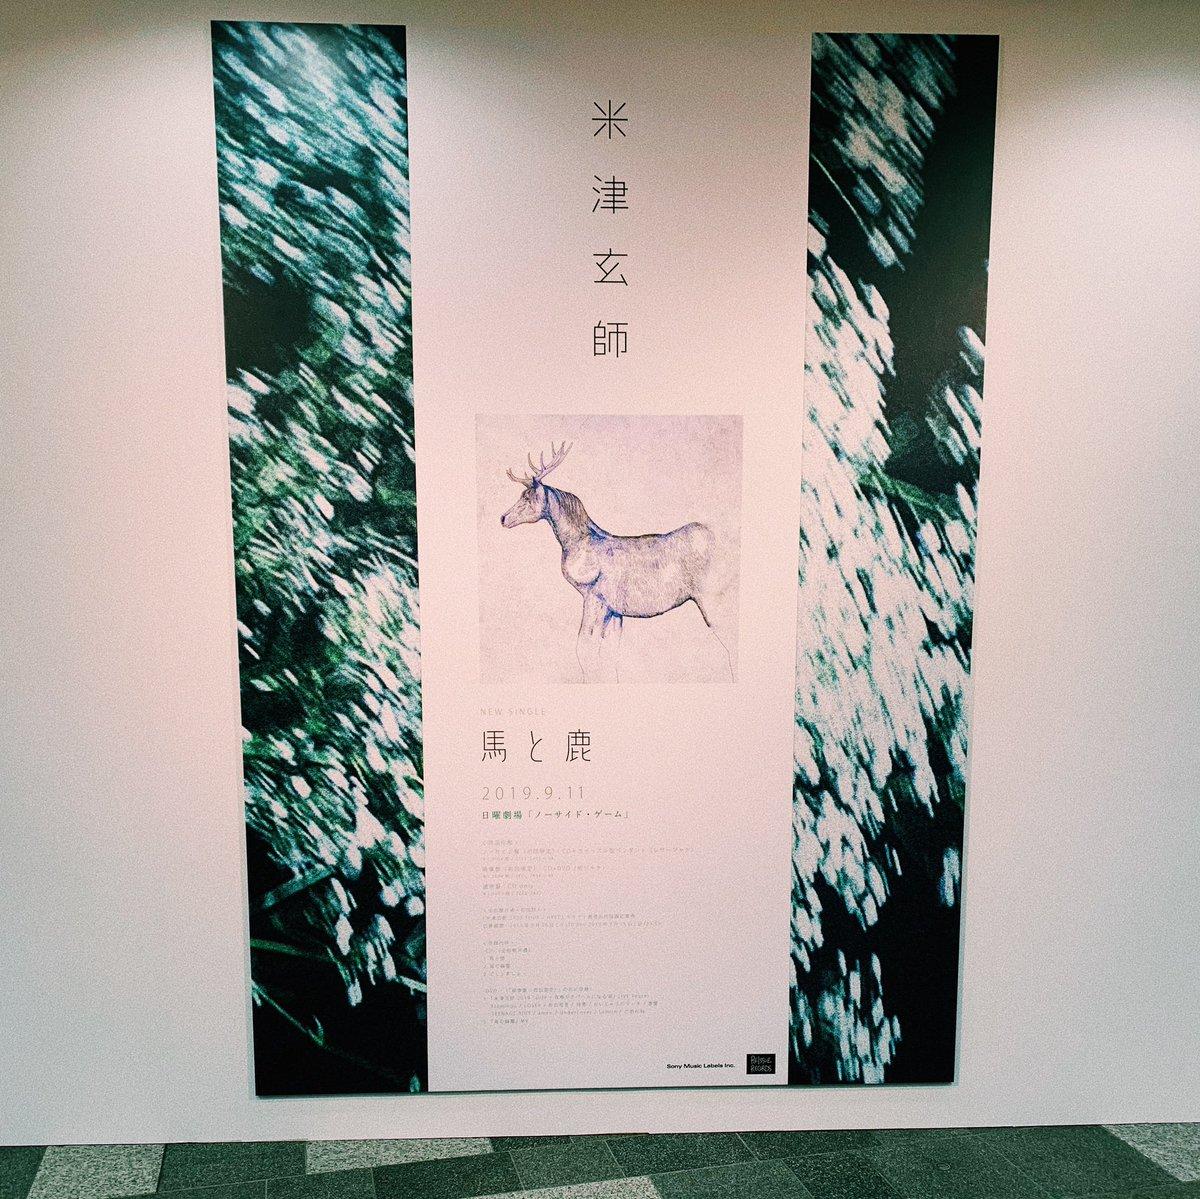 米津 玄 師 馬 と 鹿 mv